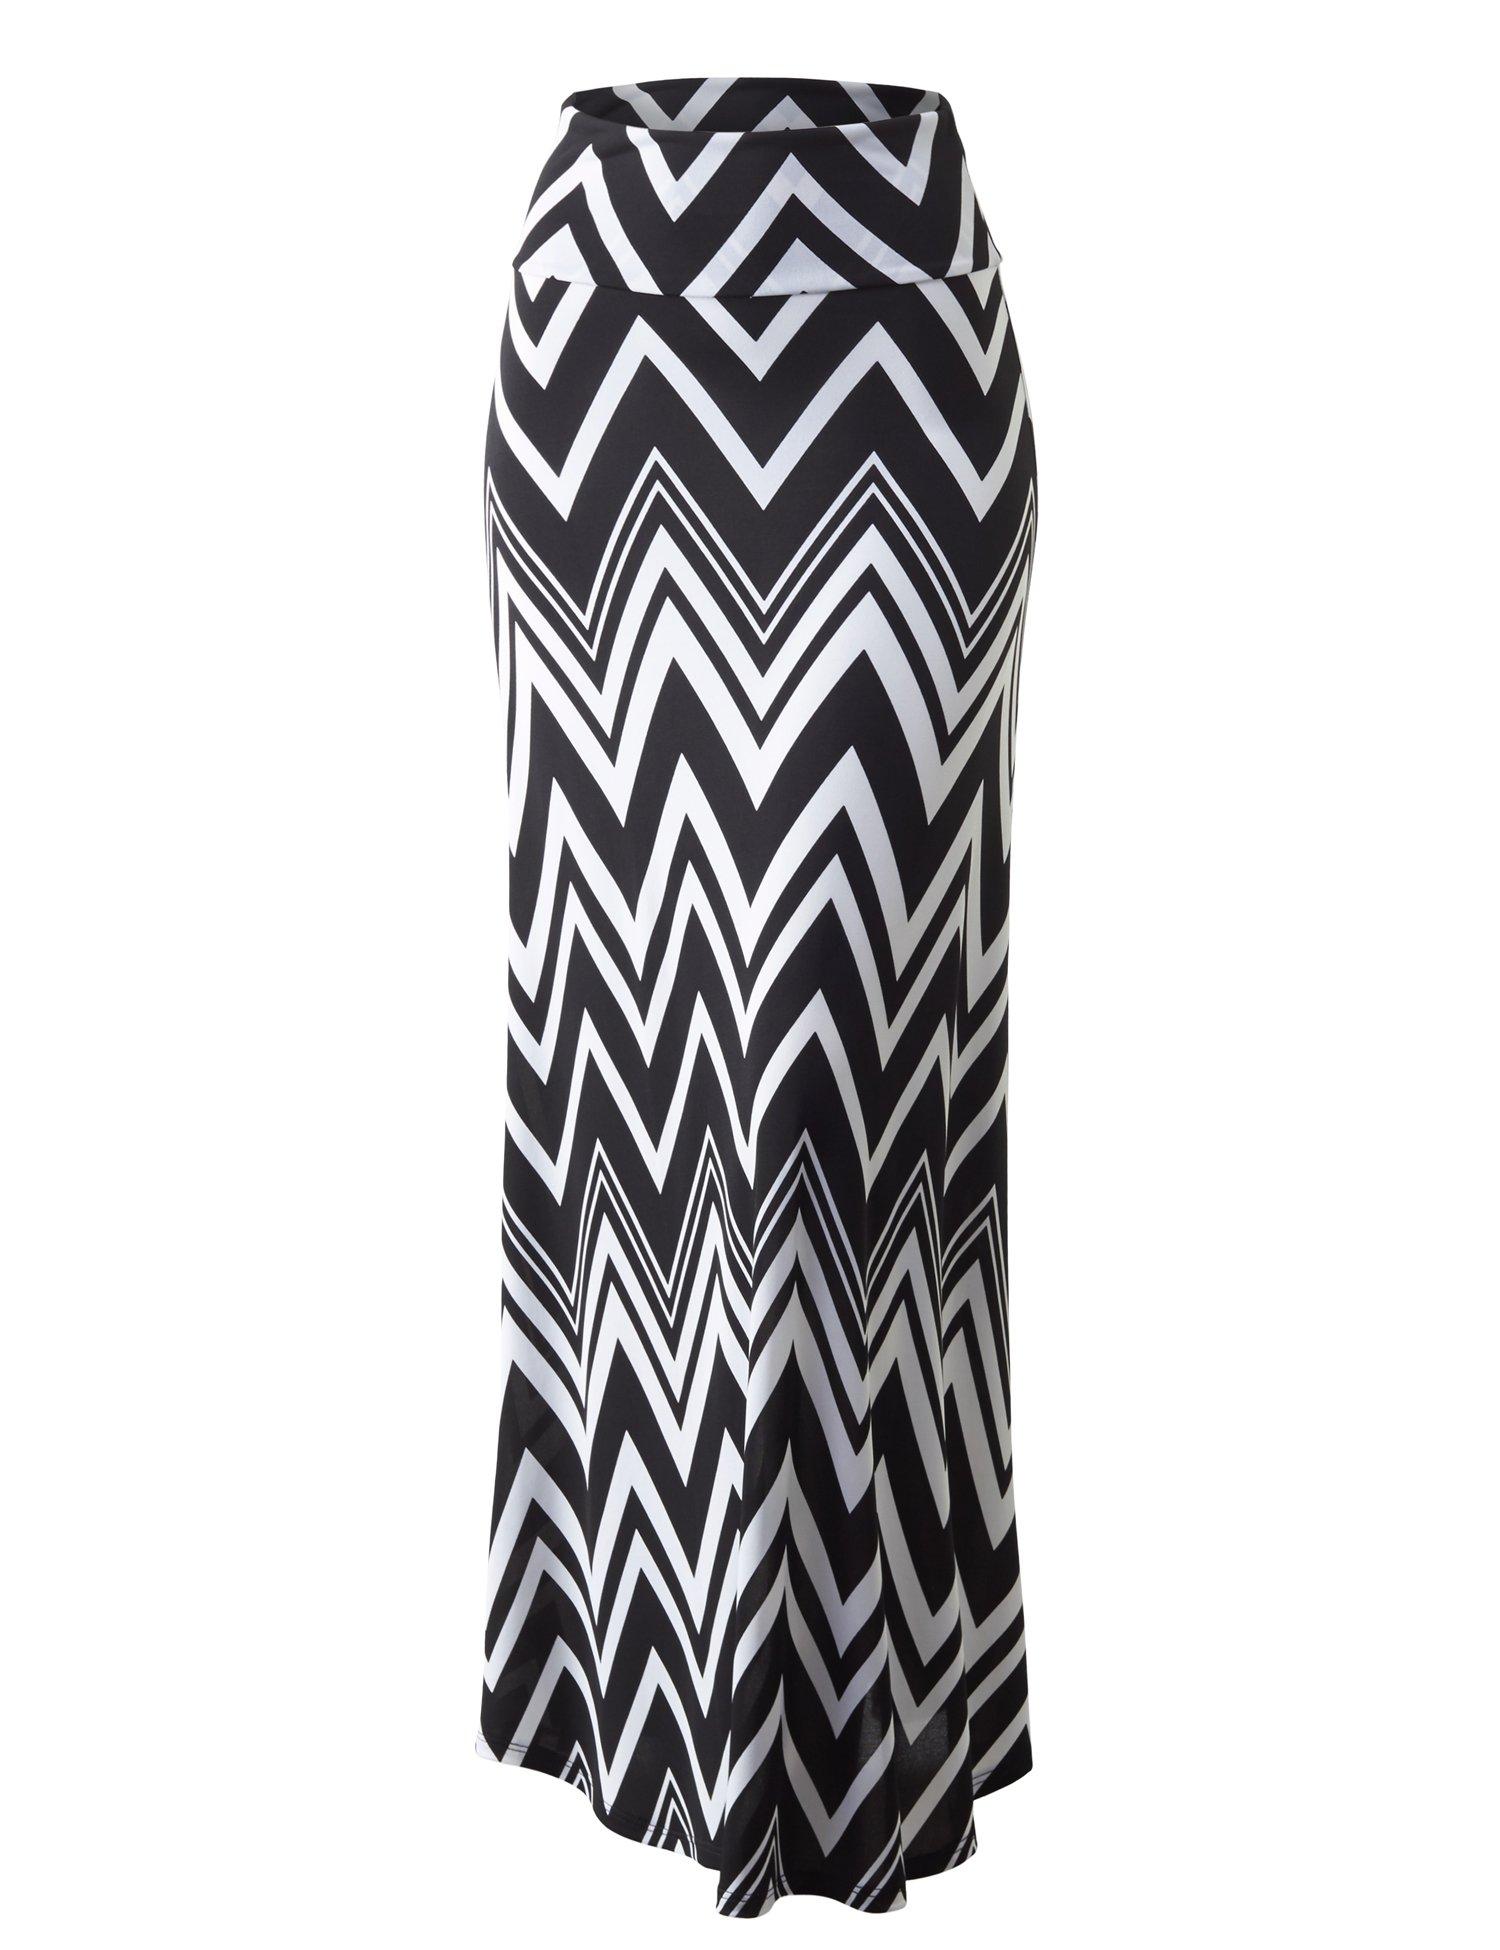 Lock and Love WB1191 Womens Chevron Print Maxi Skirt XXXL Black_White